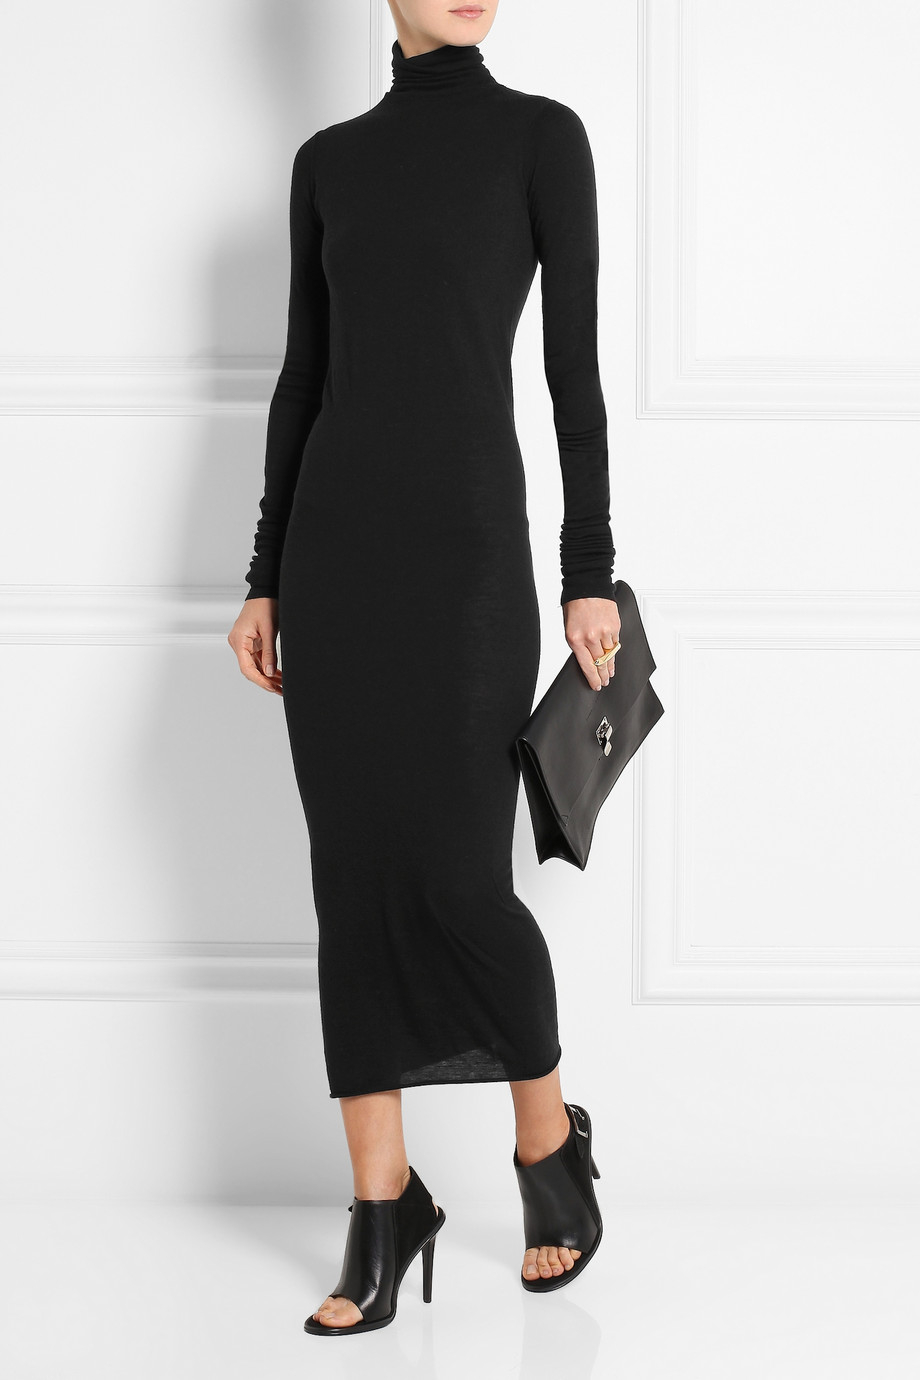 Rick Owens Lilies Turtleneck Jersey Midi Dress In Black Lyst